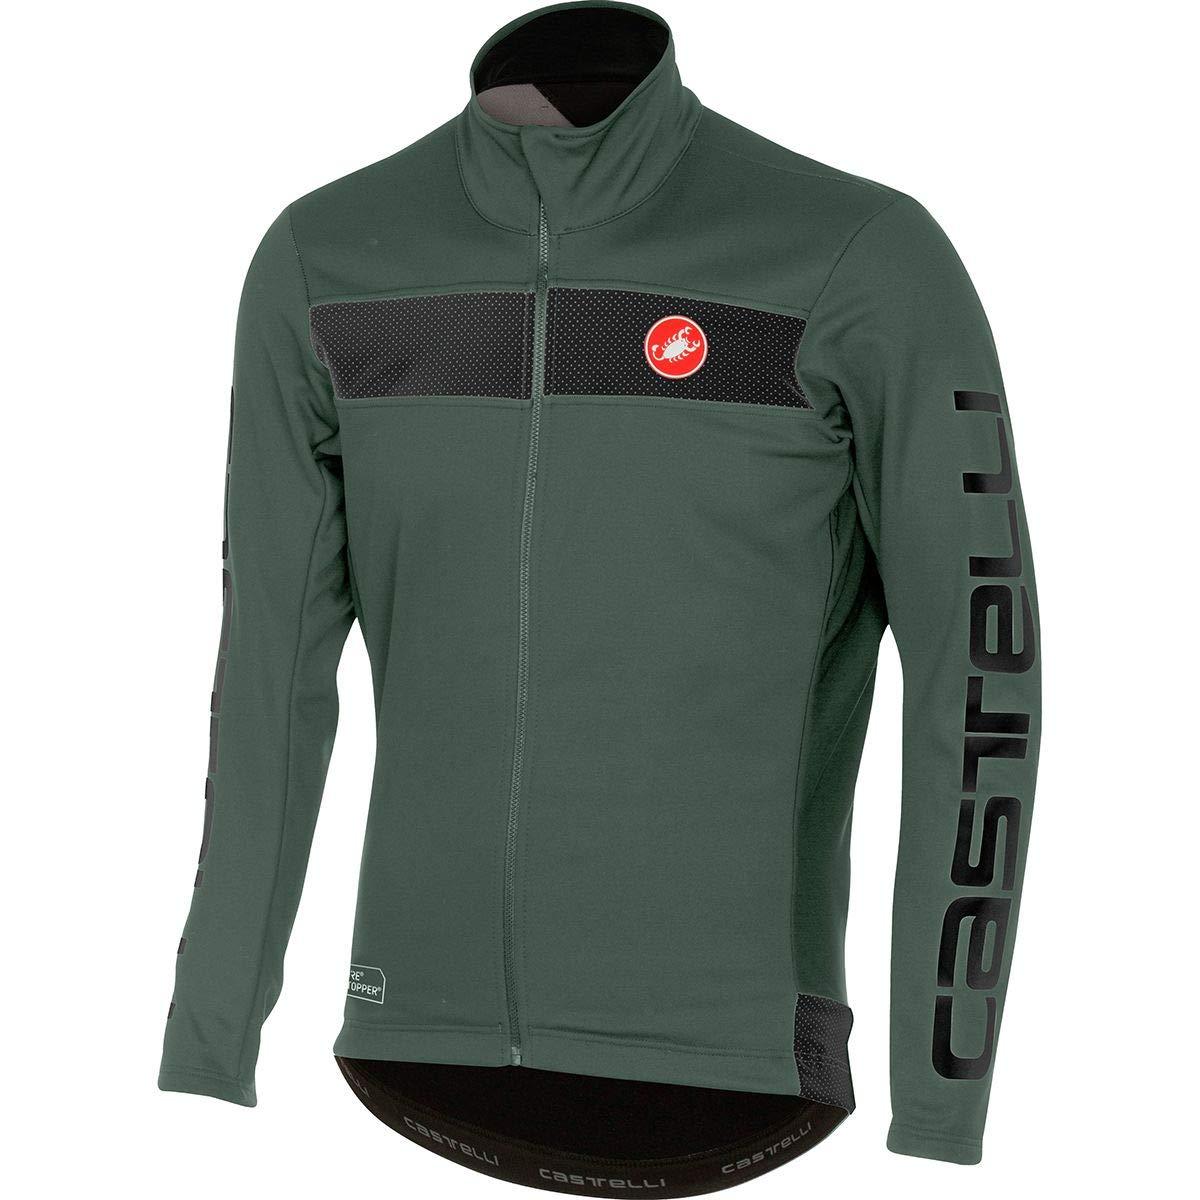 Castelli Raddoppia Jacket - Men's Forest Gray, L